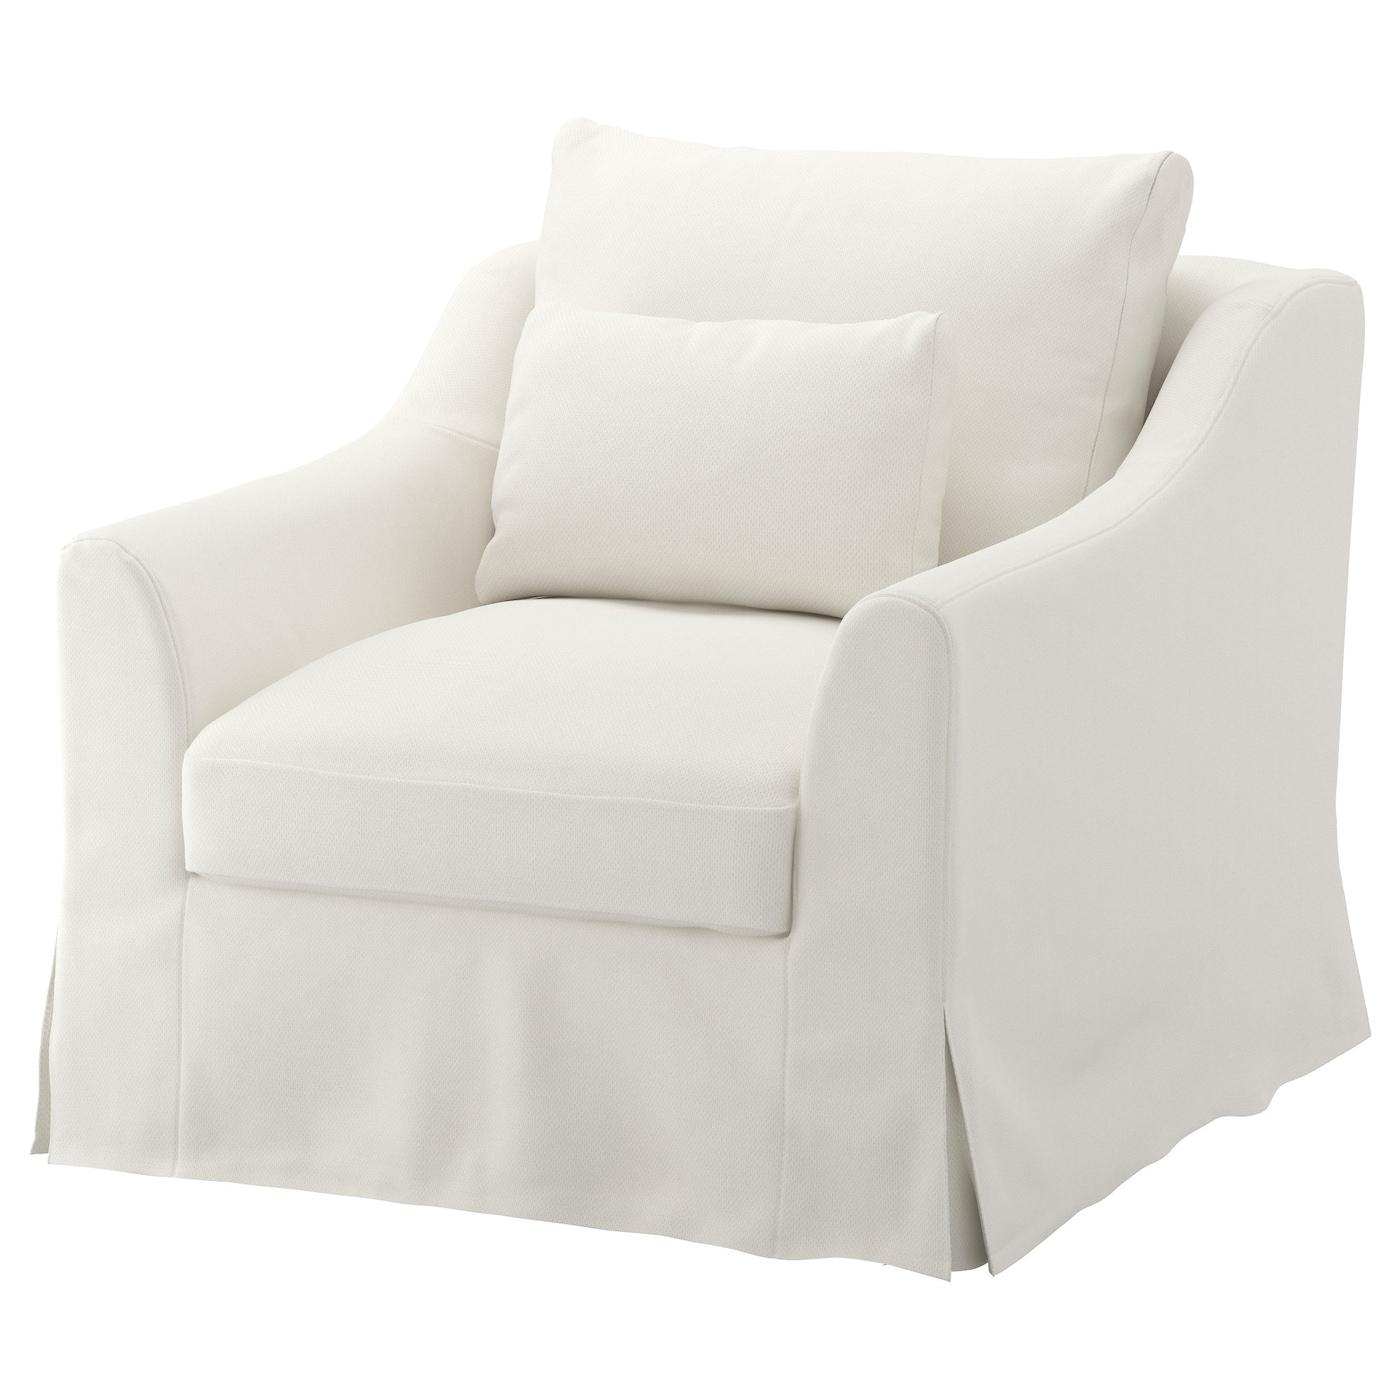 f rl v fauteuil flodafors blanc ikea. Black Bedroom Furniture Sets. Home Design Ideas